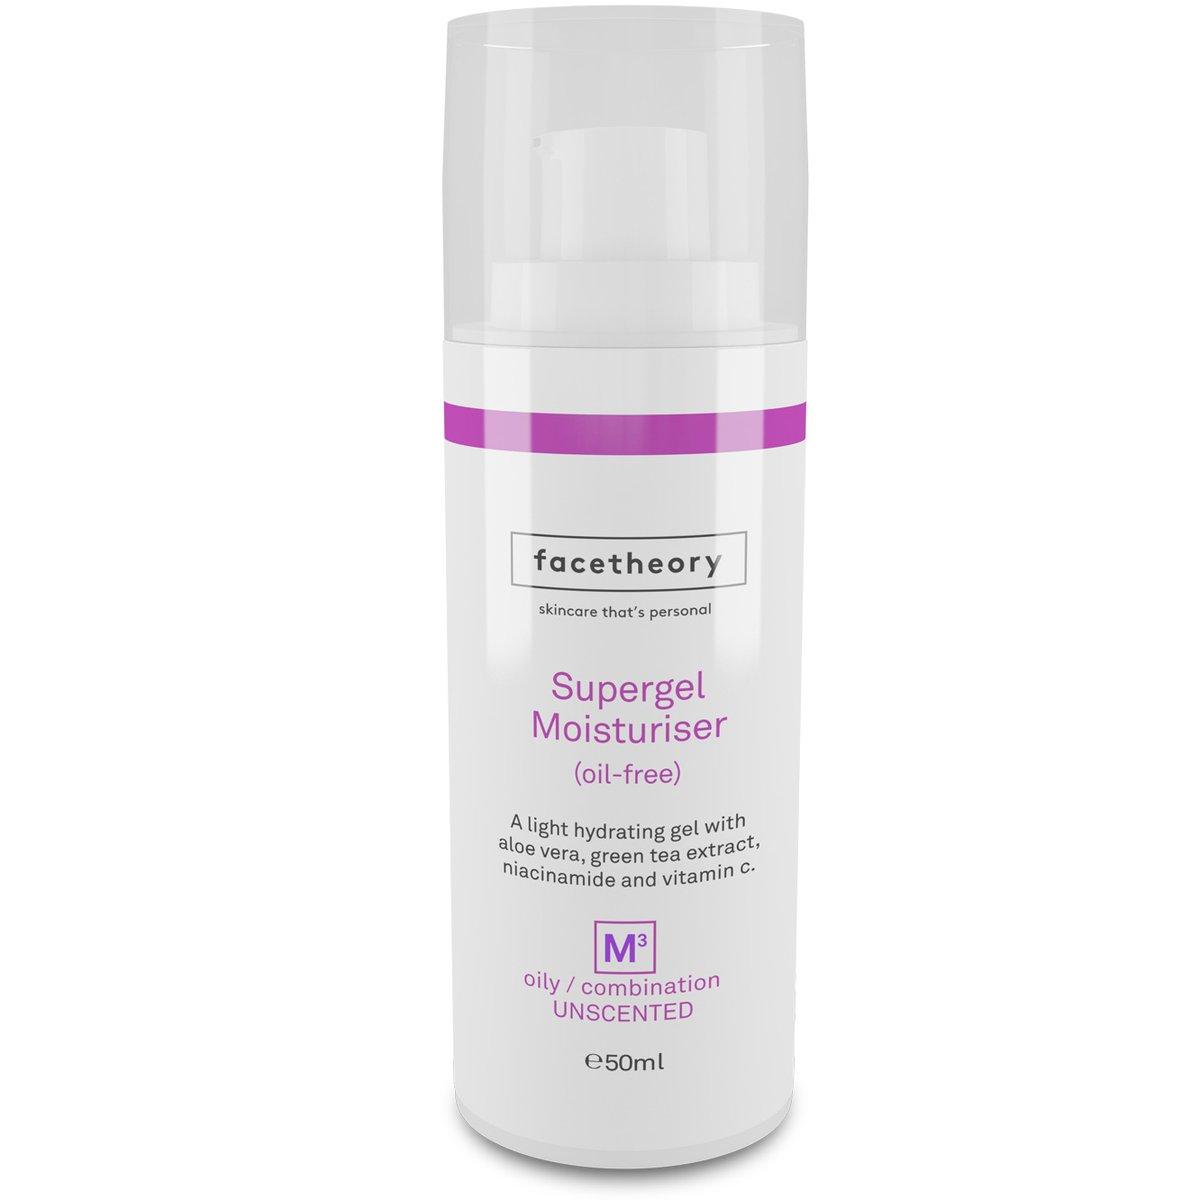 M3_Oil-Free-Supergel moisturiser FAcetheory.jpg